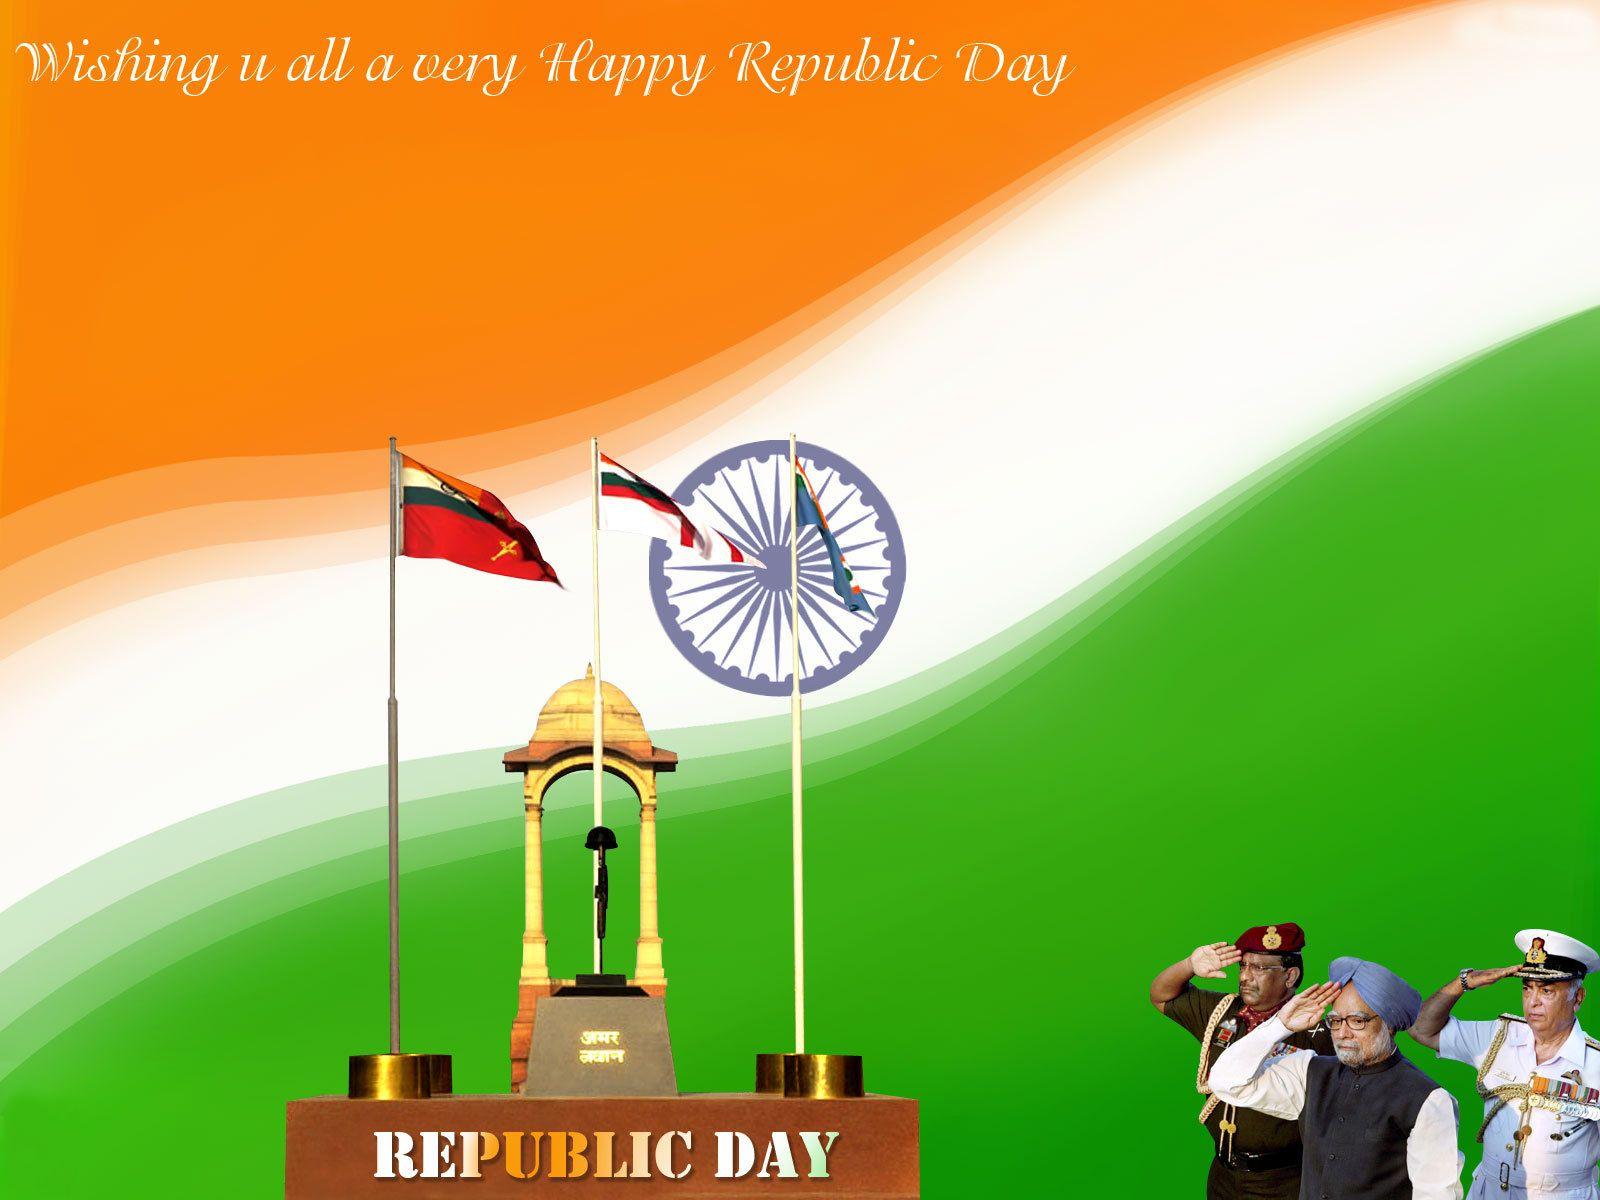 Republic Day National Flag Indian Republic Day Pics â Free Hd